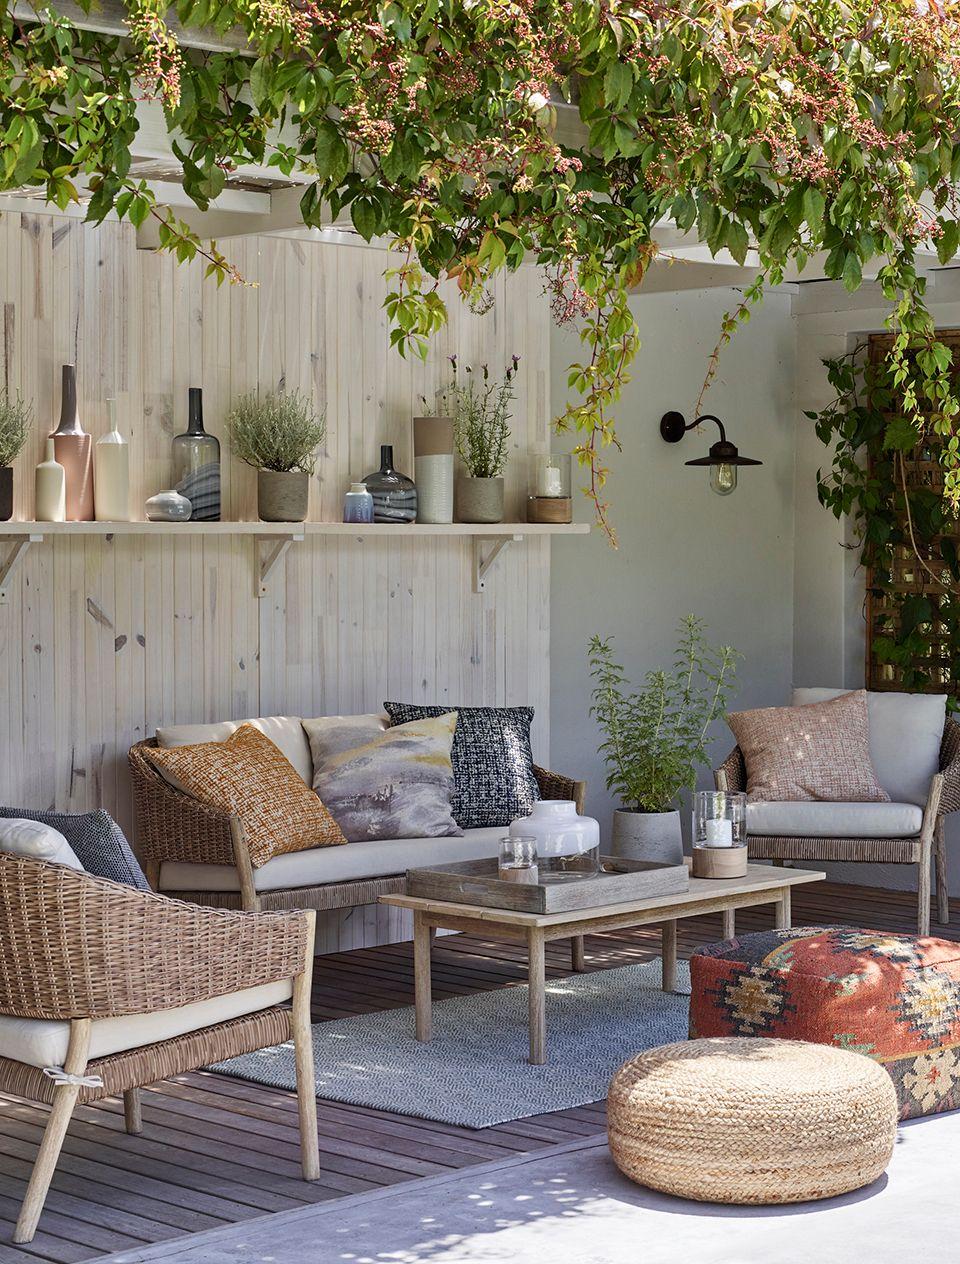 Garden sofa with plants